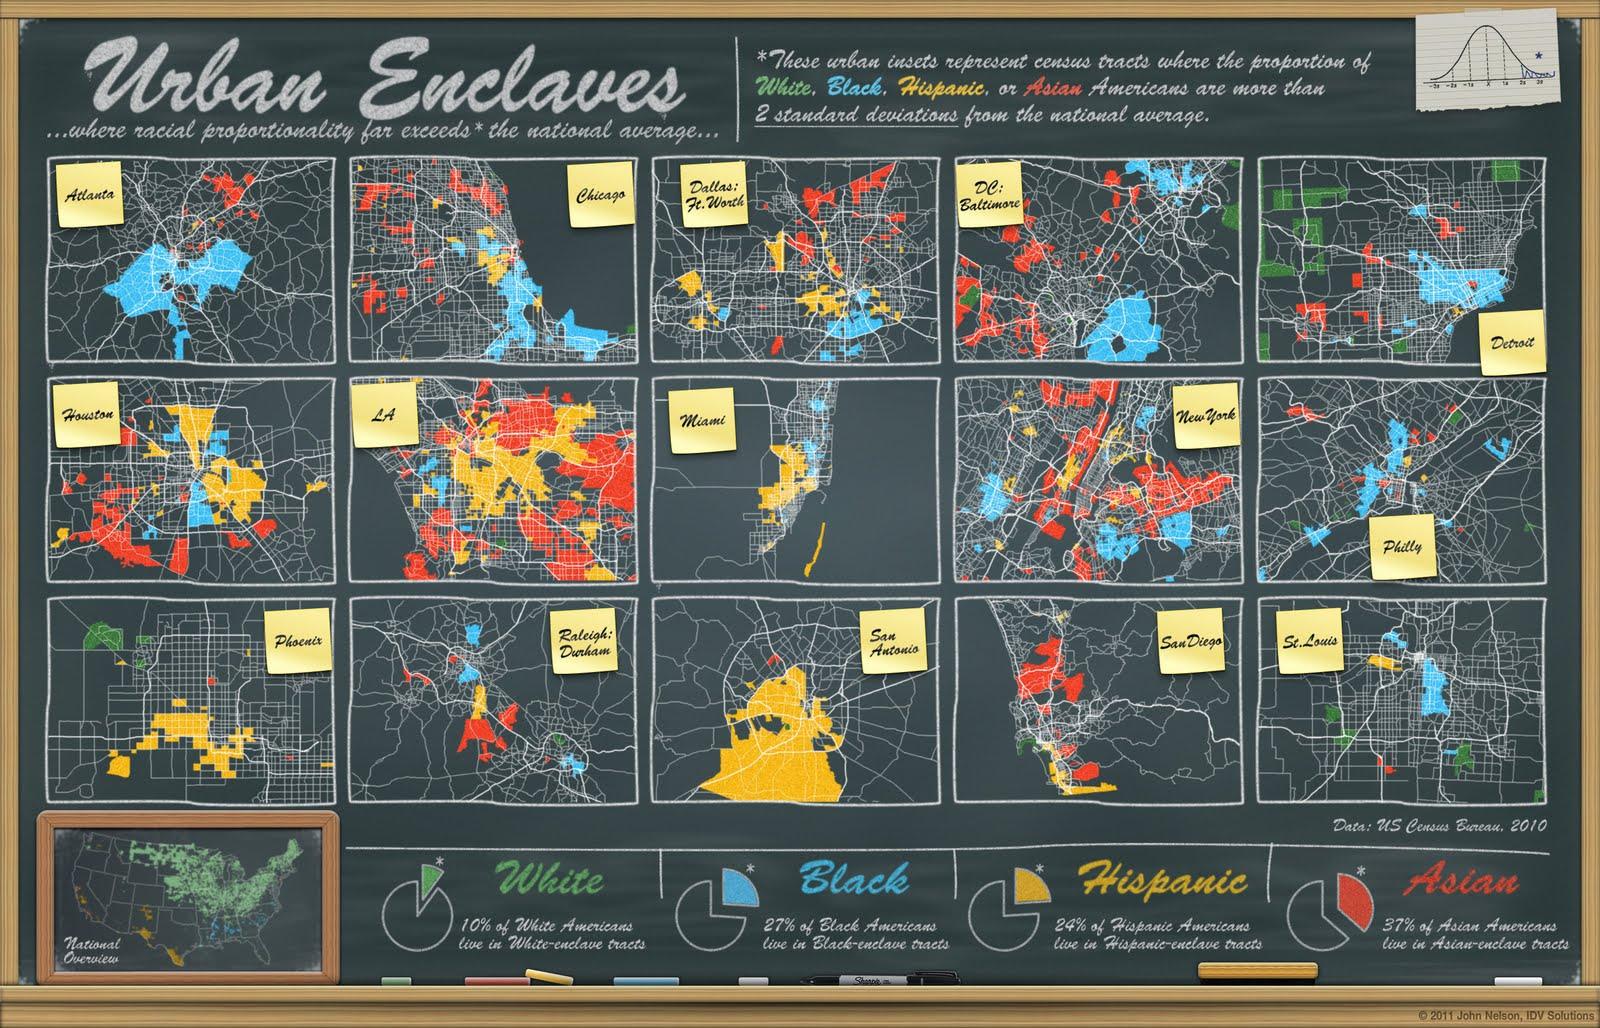 uxblog idv solutions user experience chalkboard maps urban enclaves